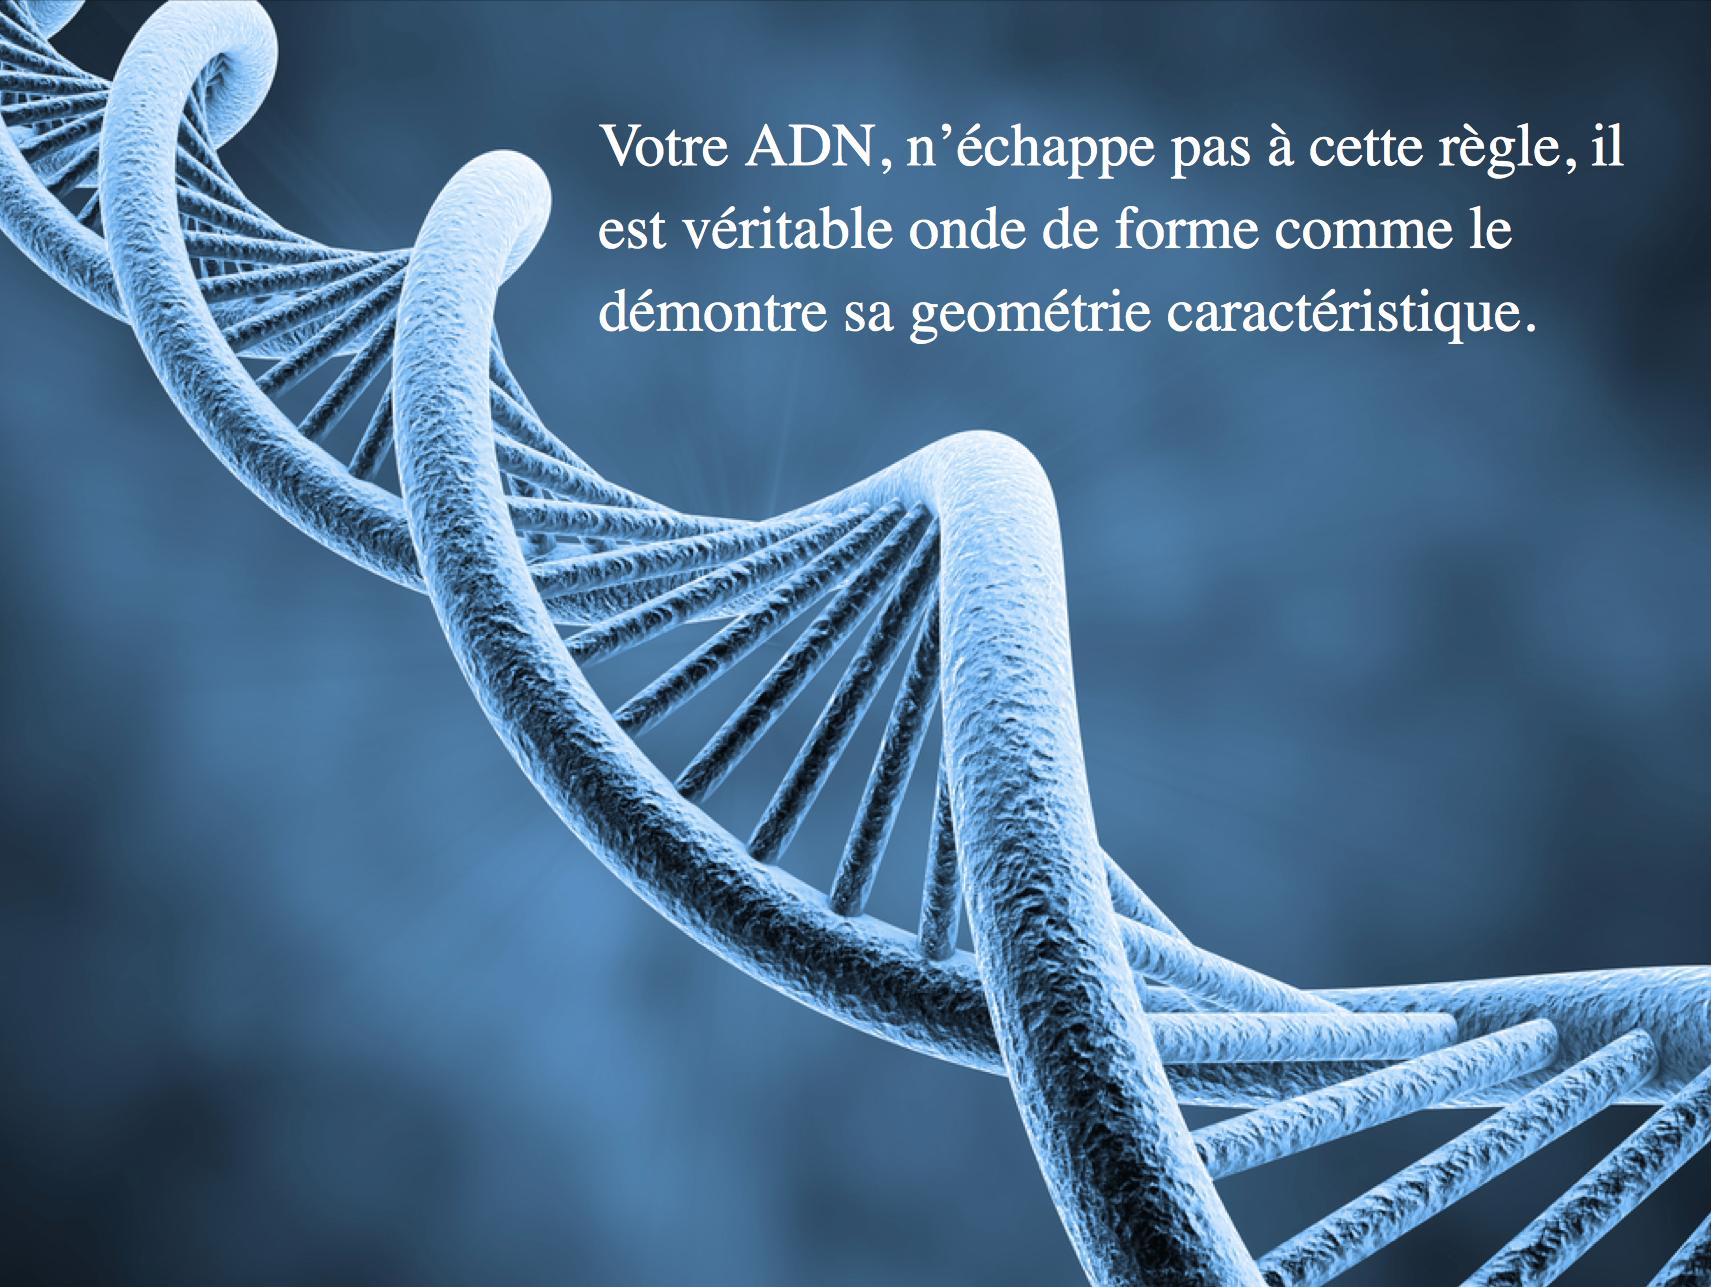 onde formes , ADN, image de synthèse, 3D, le son influence l'adn